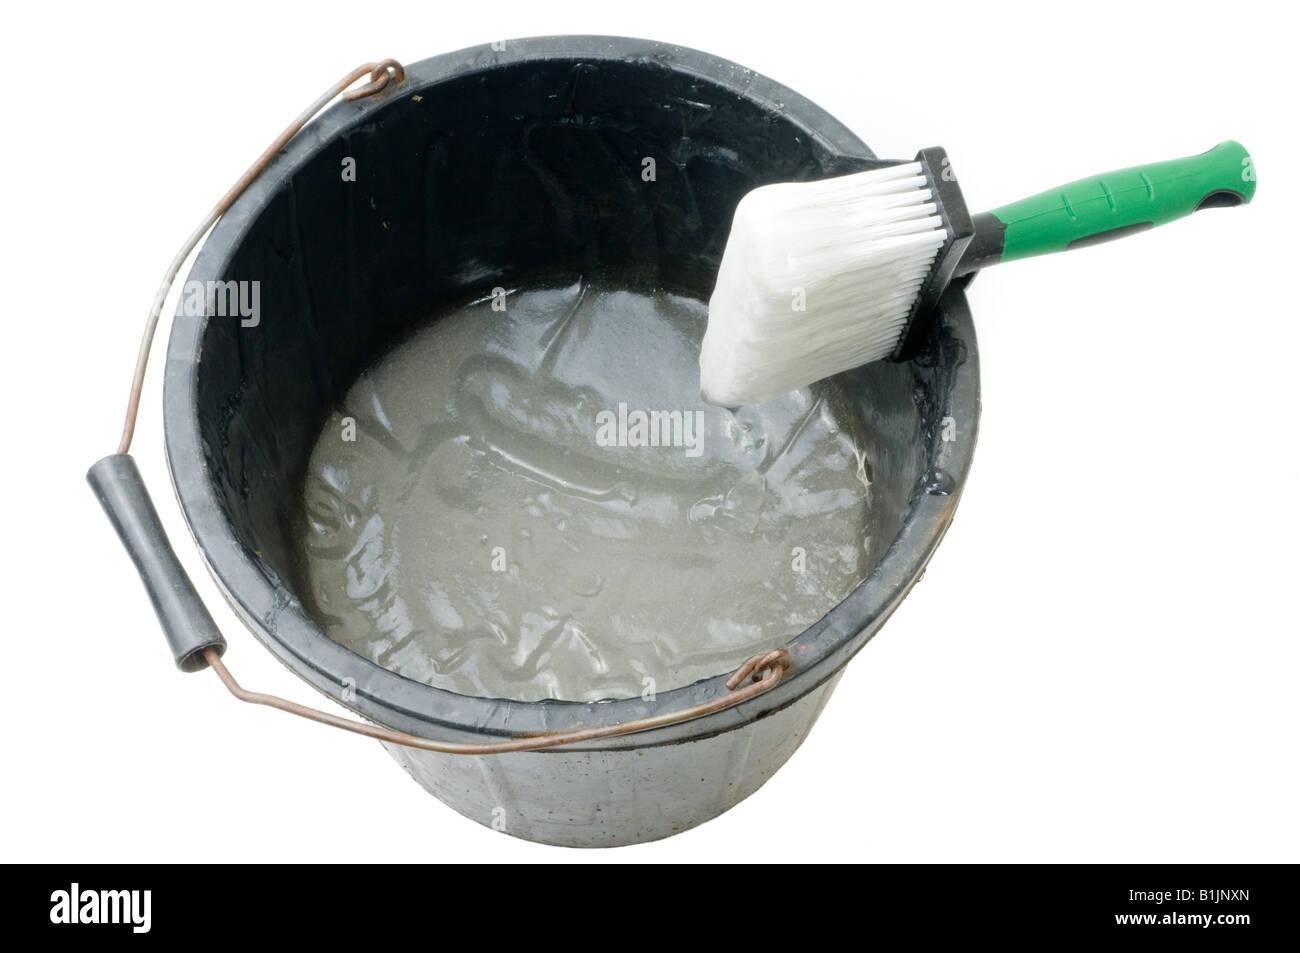 Attractive Wallpaper Paste Brush And Black Bucket